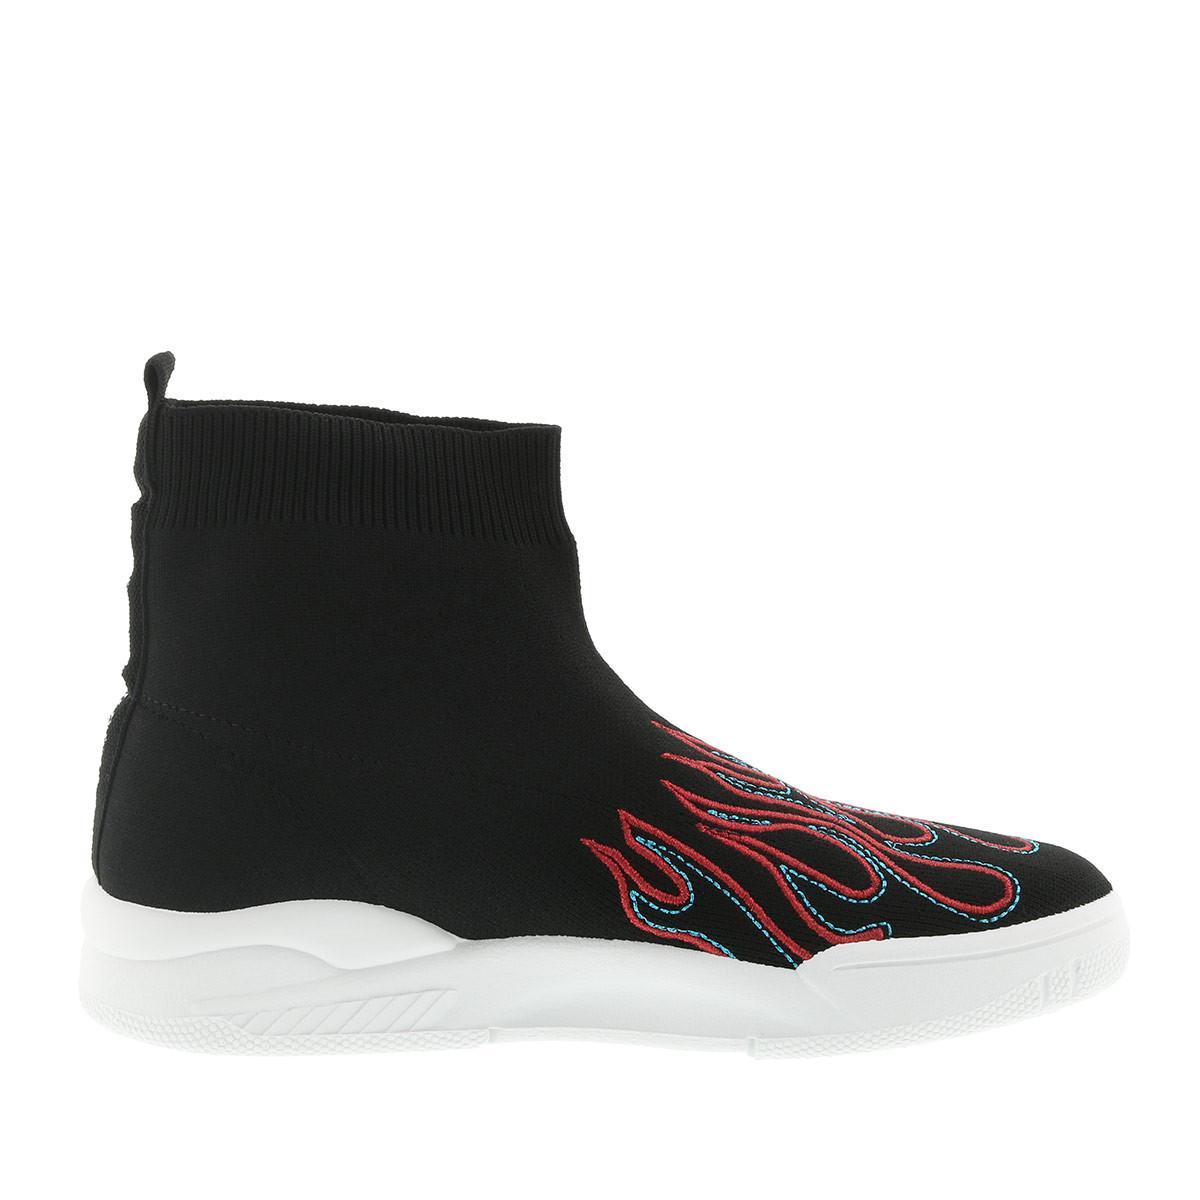 Chiara Ferragni Leather Sock Sneaker Femme Black